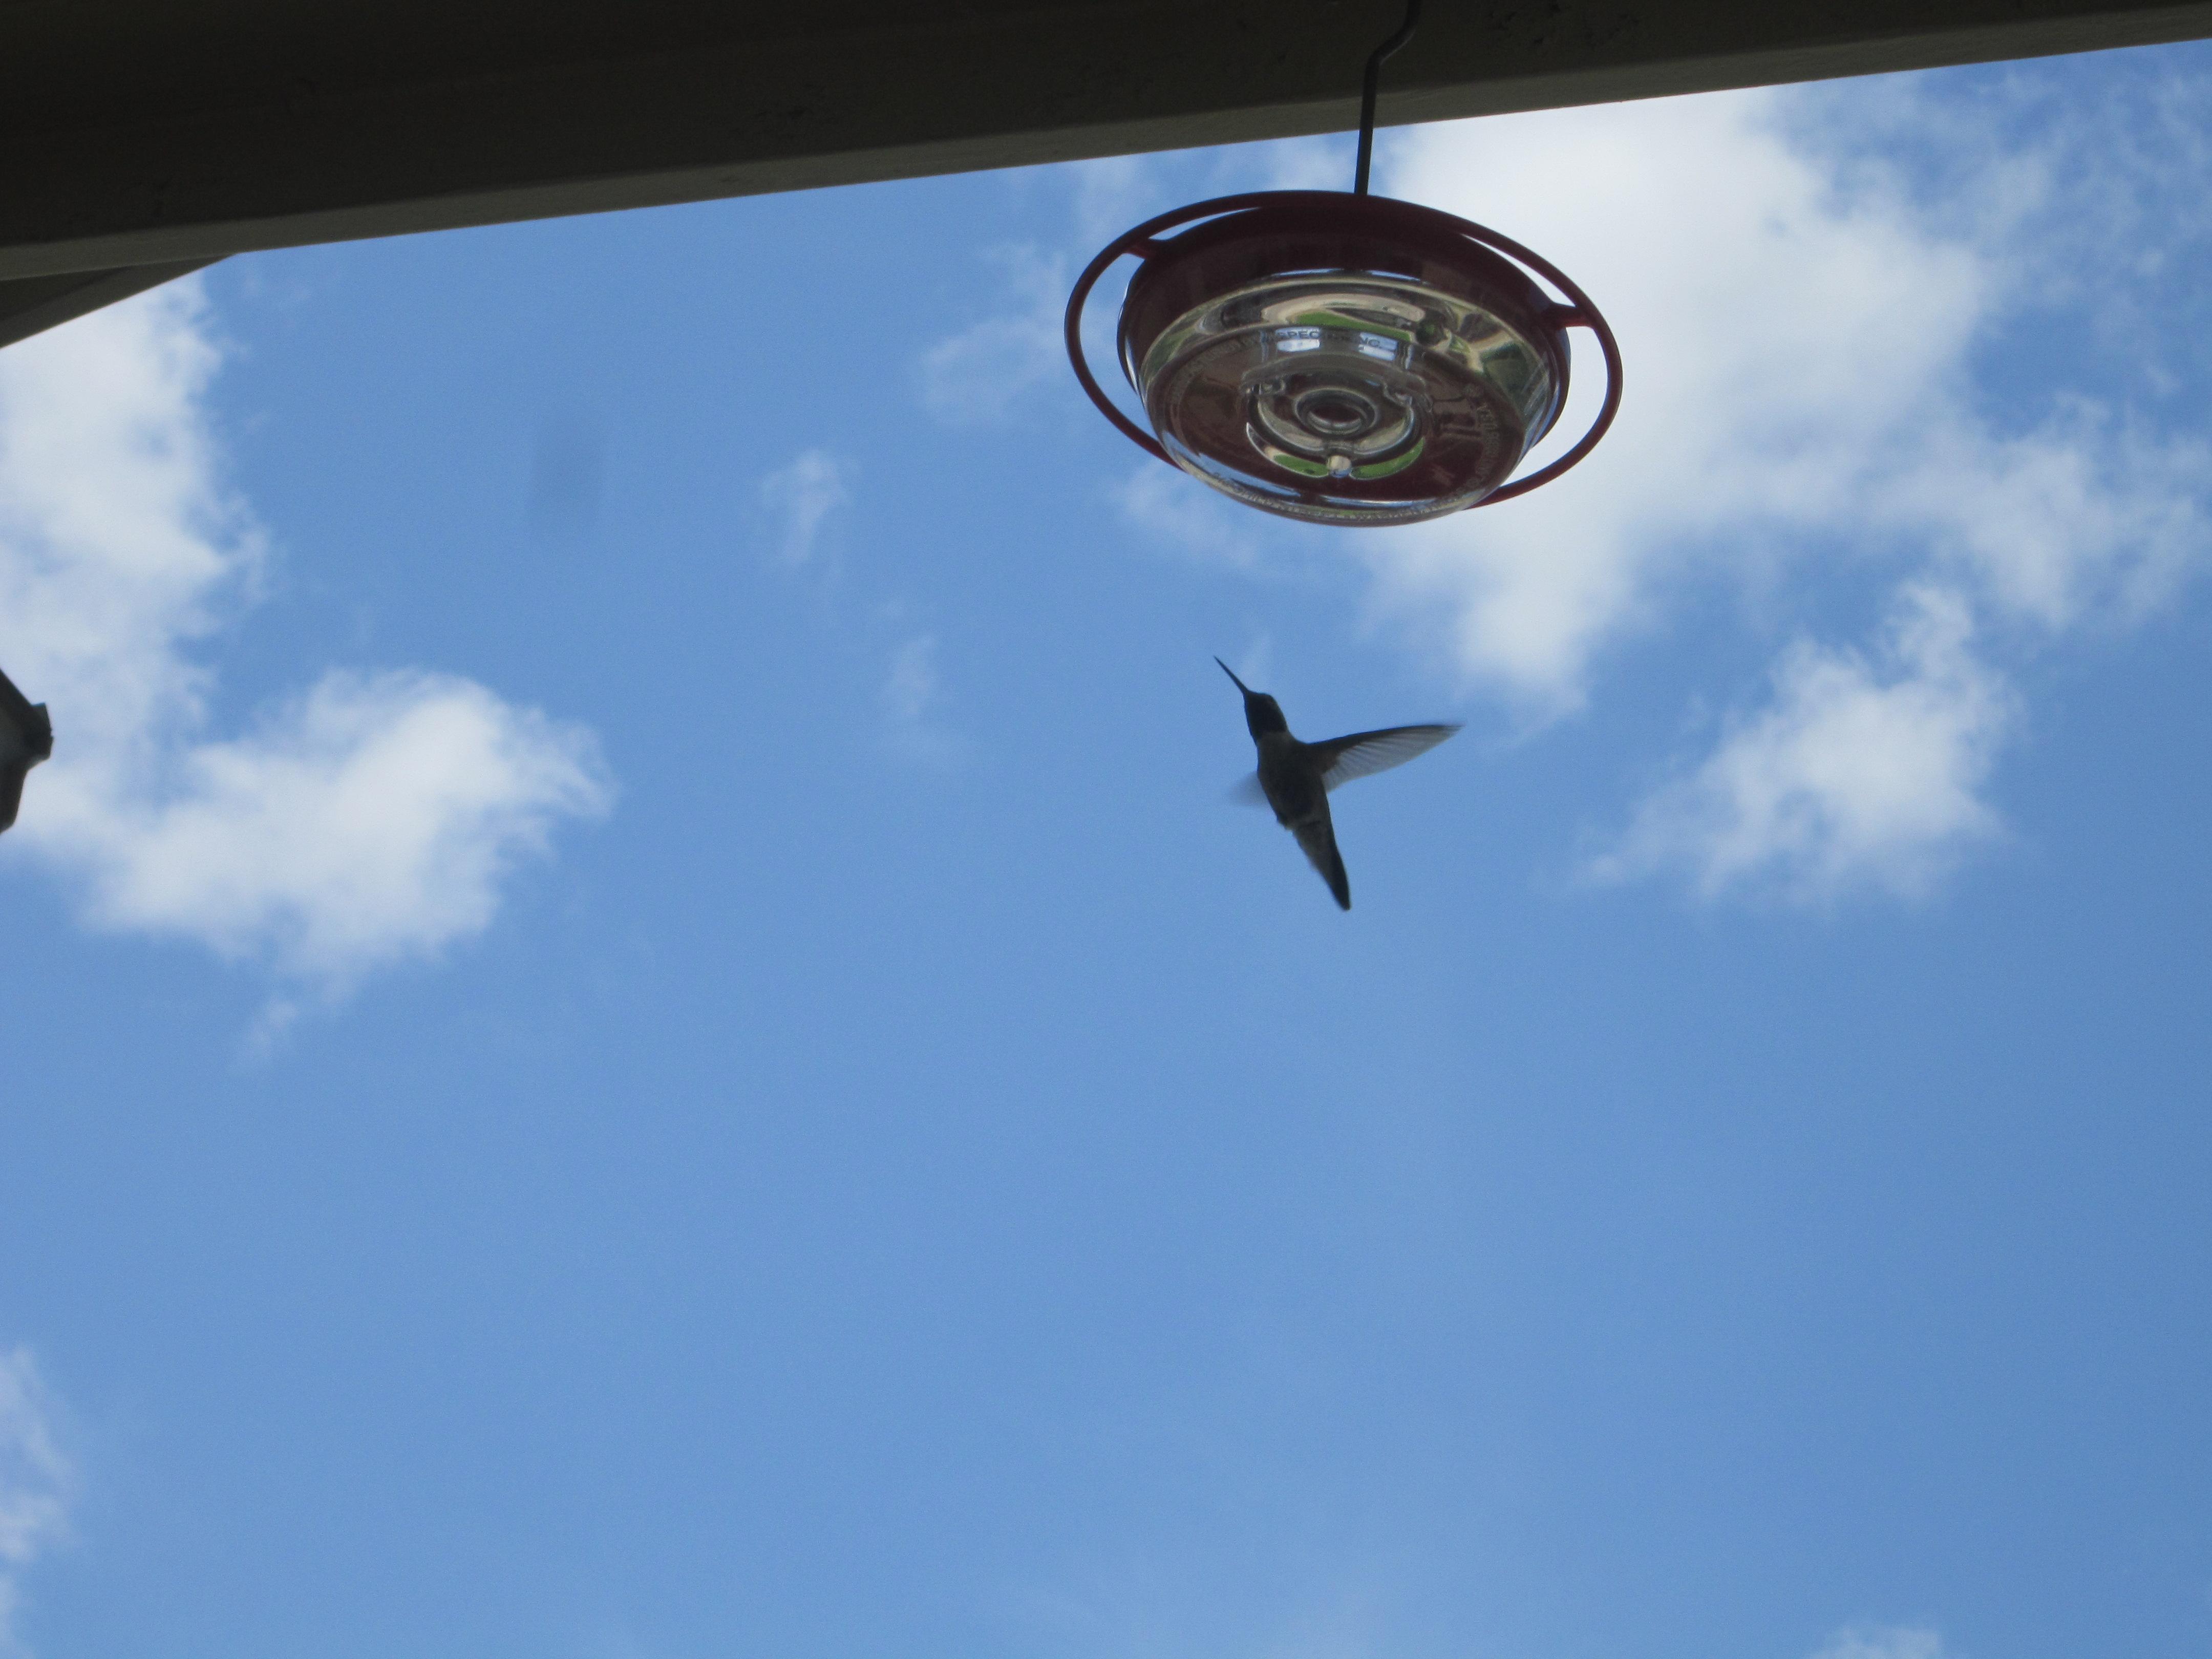 The Hummingbird – An Advent Reflection